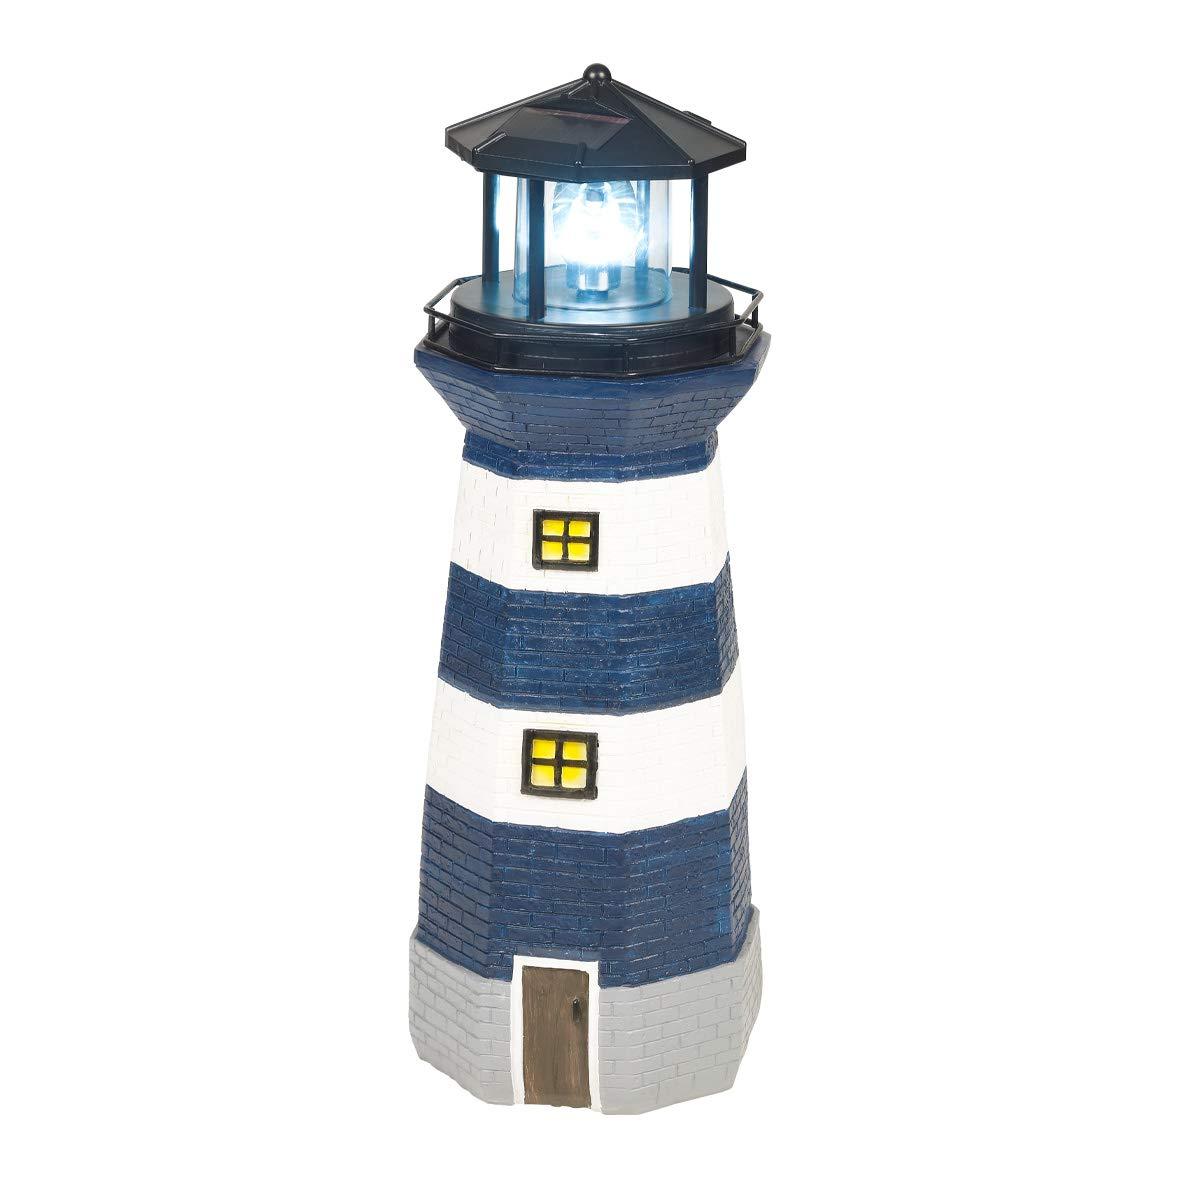 Groovy Gardenkraft 11280 Solar Revolving Led Lighthouse Decorative Wiring Digital Resources Anistprontobusorg